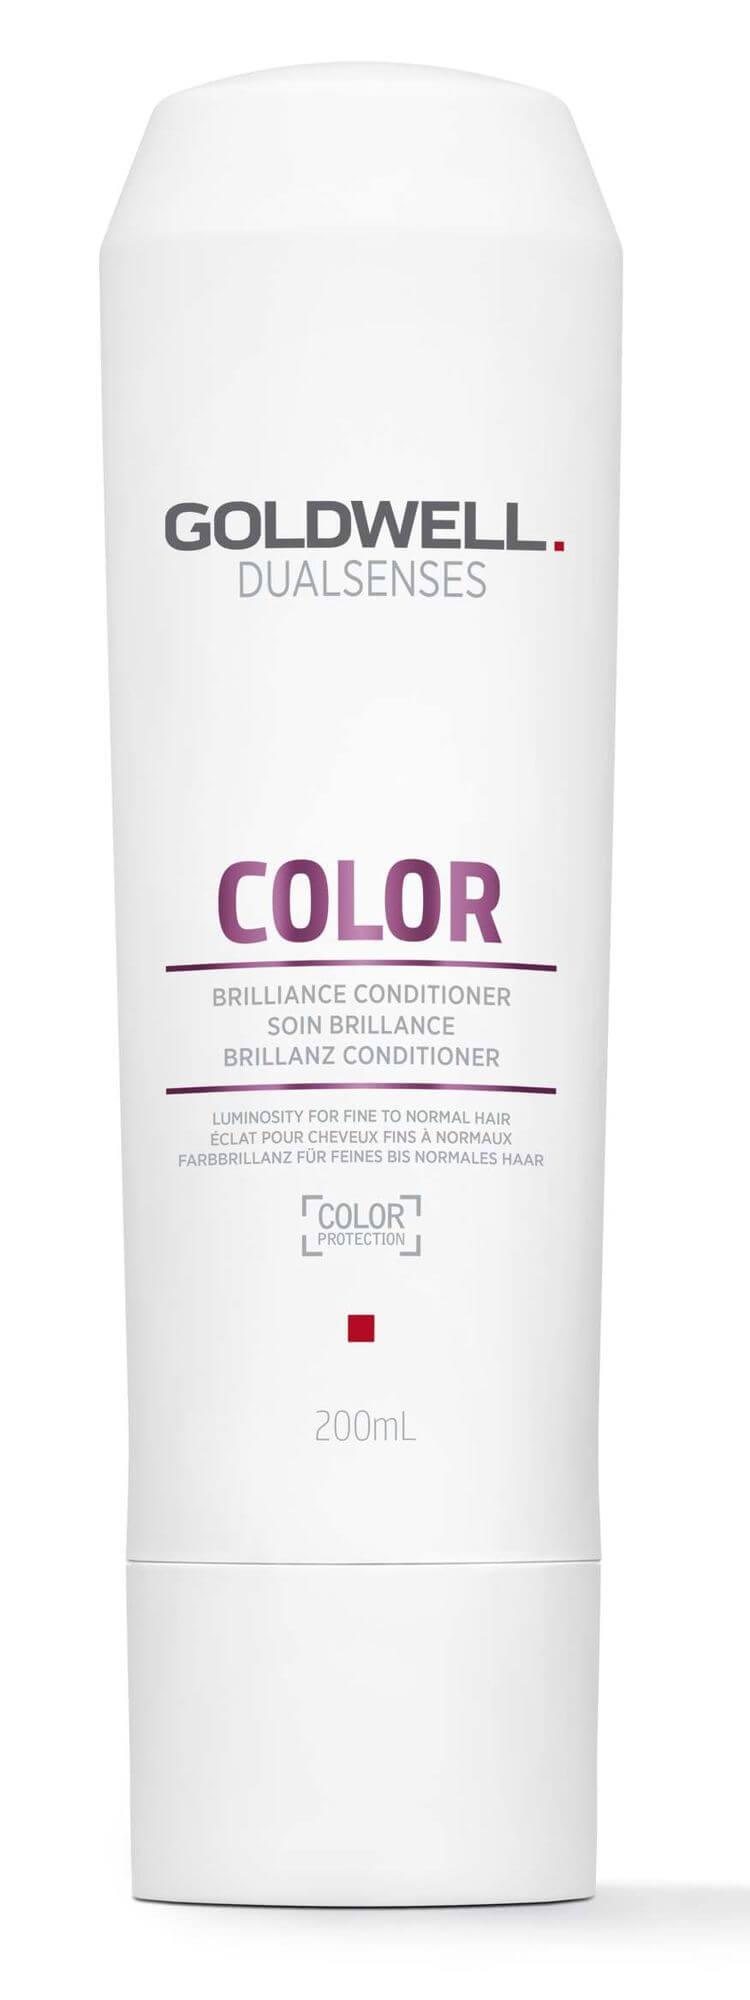 Dualsenses Color Brilliance Conditioner.